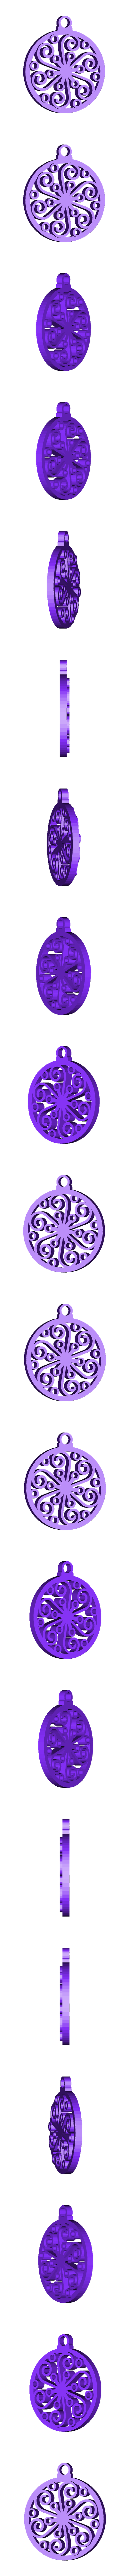 ESFERA ORNAMENTOS.stl Download OBJ file Ornamental Sphere • 3D printable design, cristoferespinozat